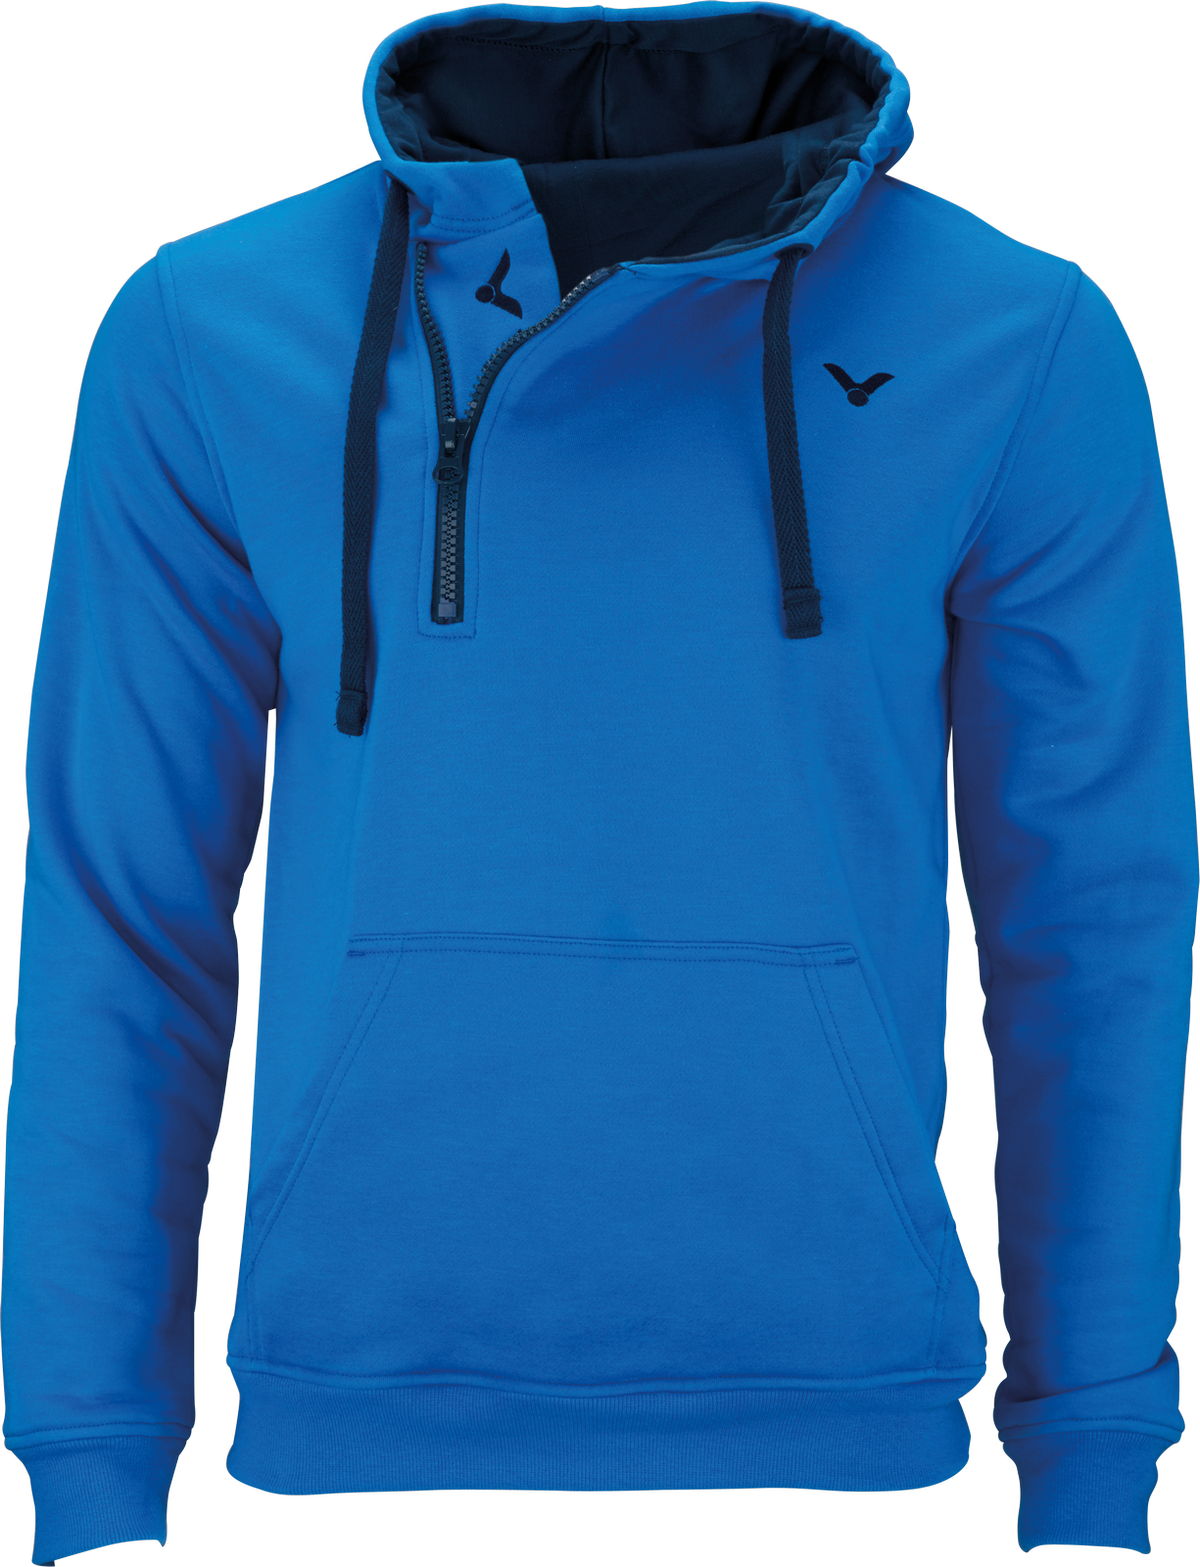 Victor sweater team 5108 badminton table tennis leisure sport training suit Blau